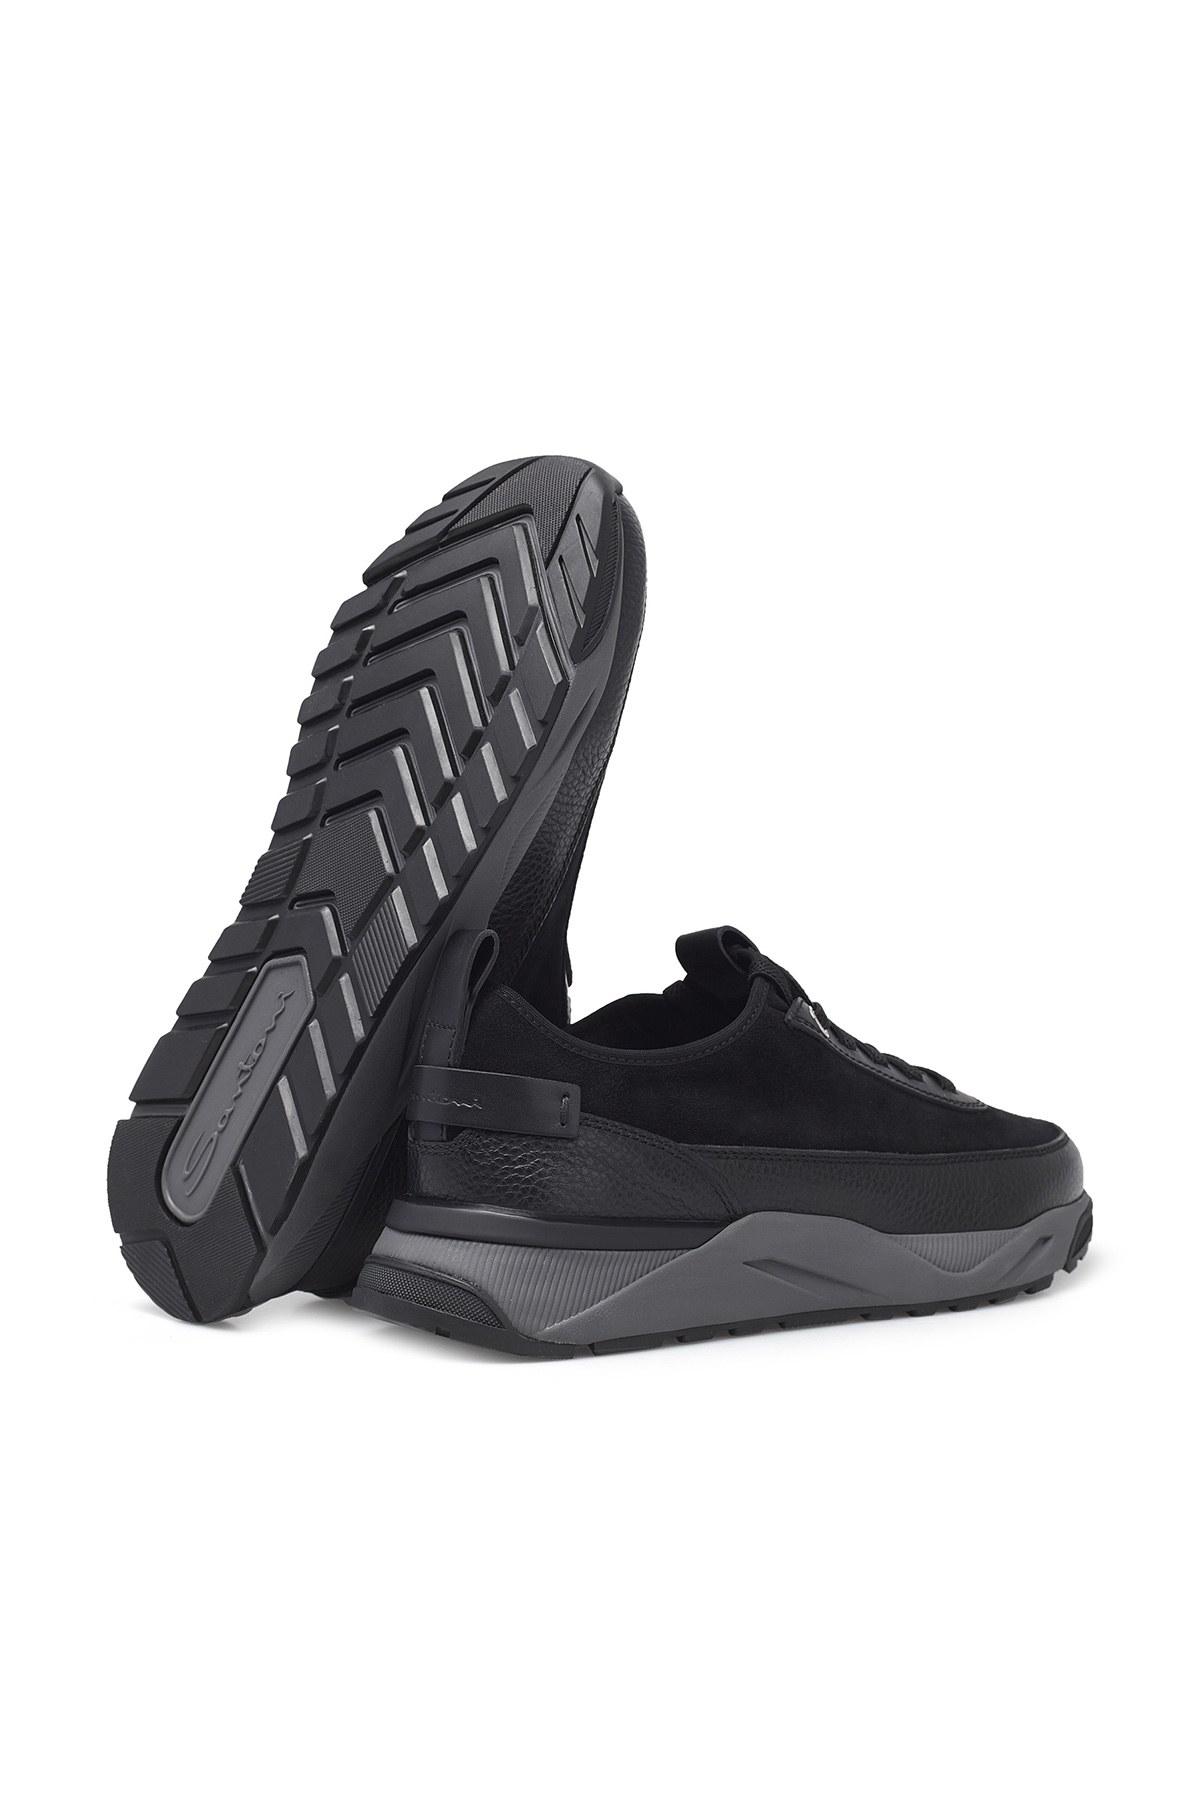 Santoni Erkek Ayakkabı MBIO21323ANERVBRN01 SİYAH